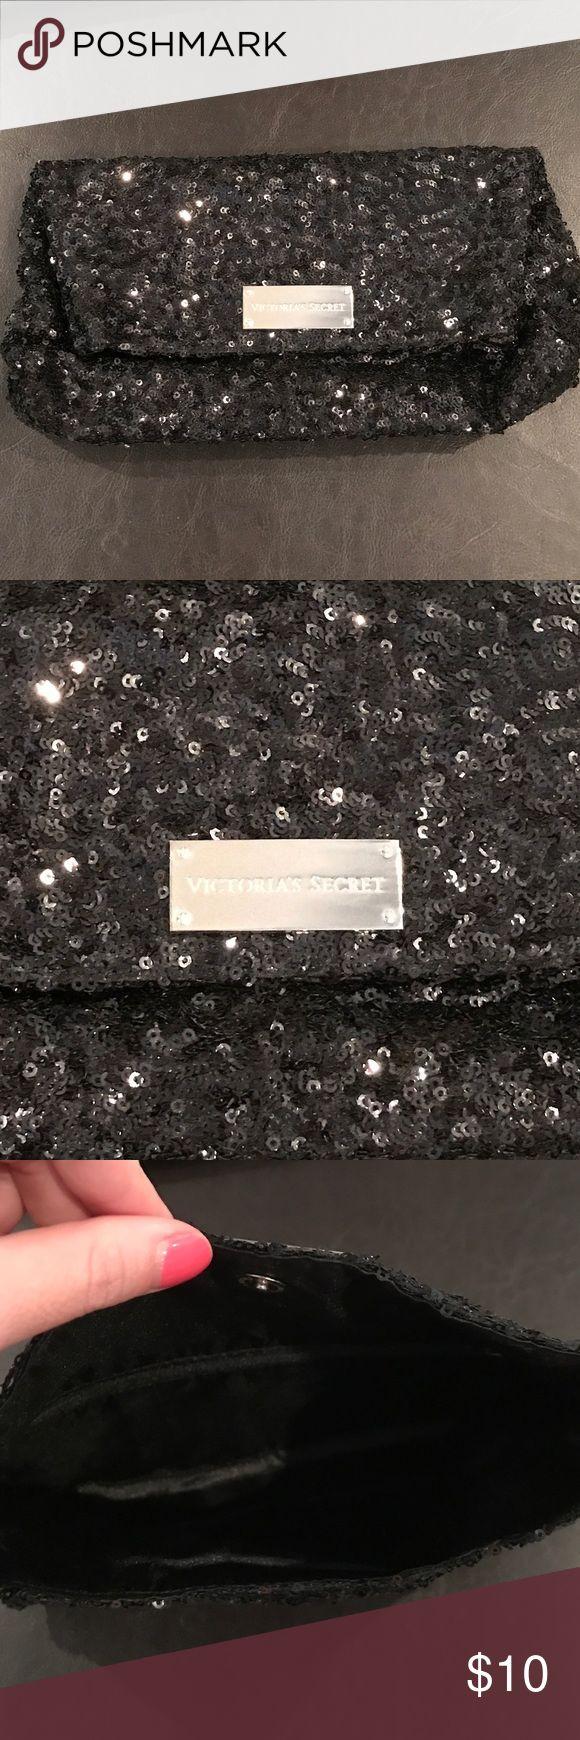 Victoria's Secret Sequin Clutch Victoria's Secret Sequin Clutch, Used Once, Looks New. Super Cute! Victoria's Secret Bags Clutches & Wristlets